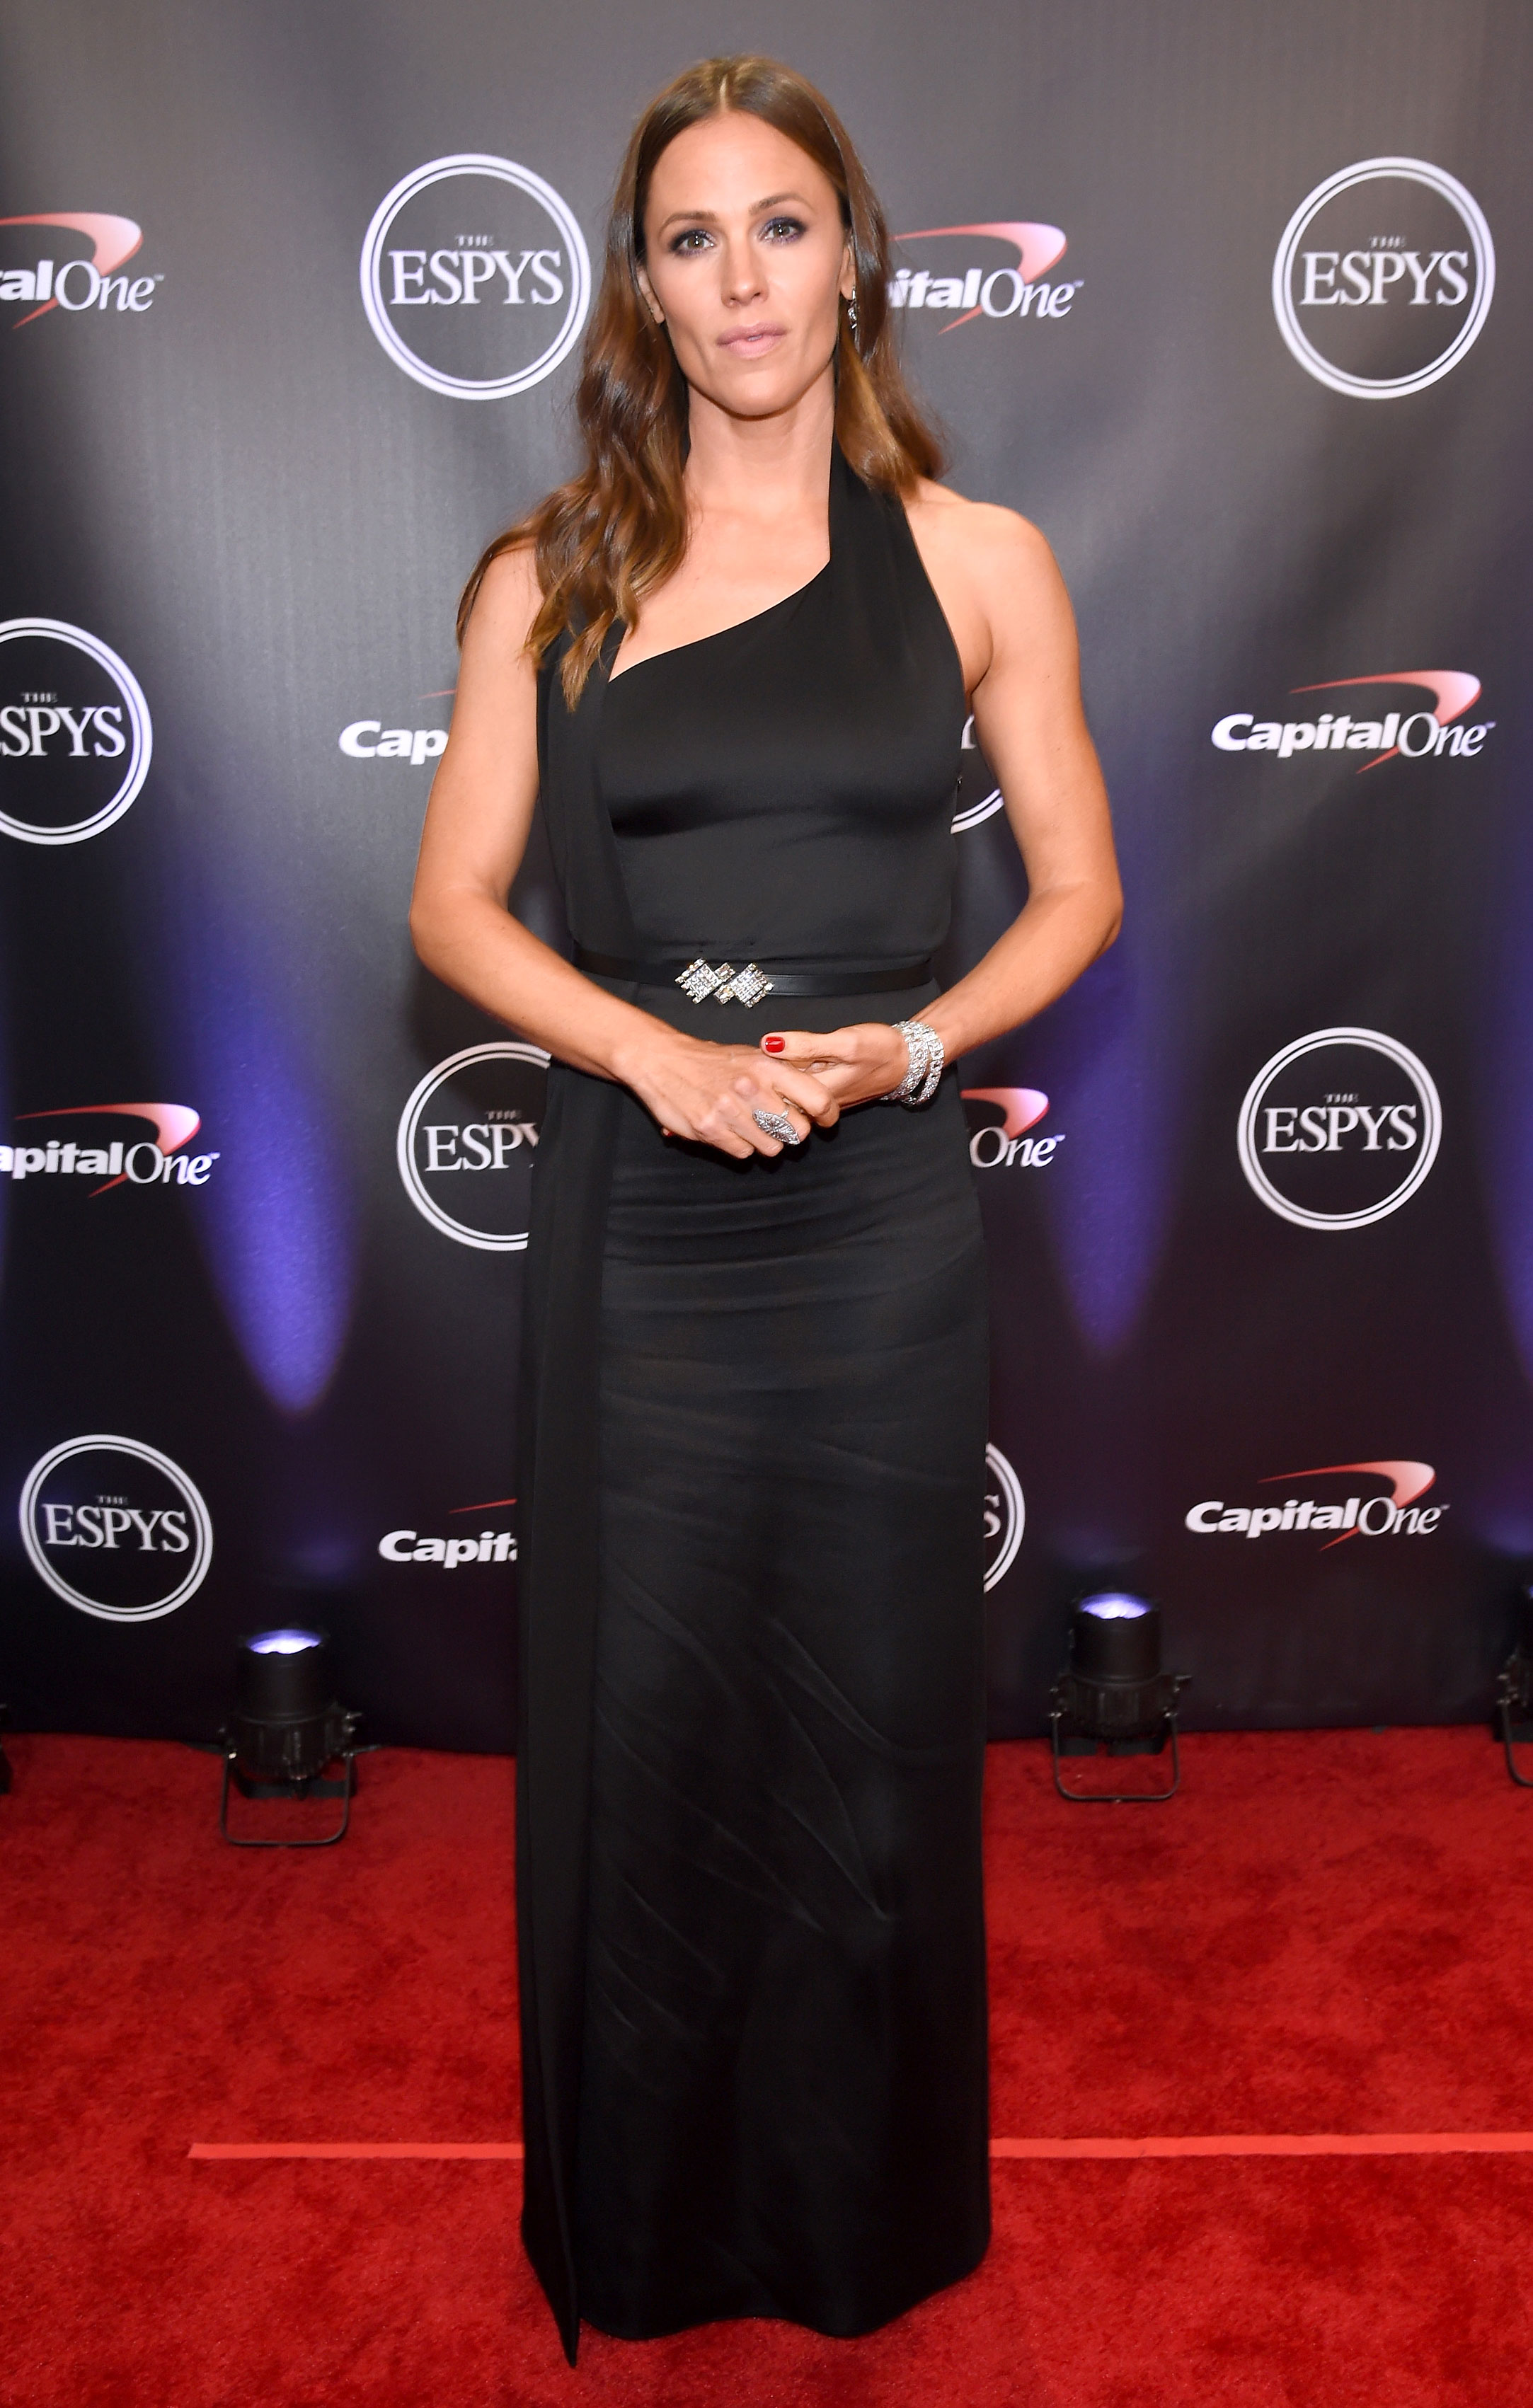 Jennifer-Garner-espys - Wearing an asymmetrical black Lanvin gown.